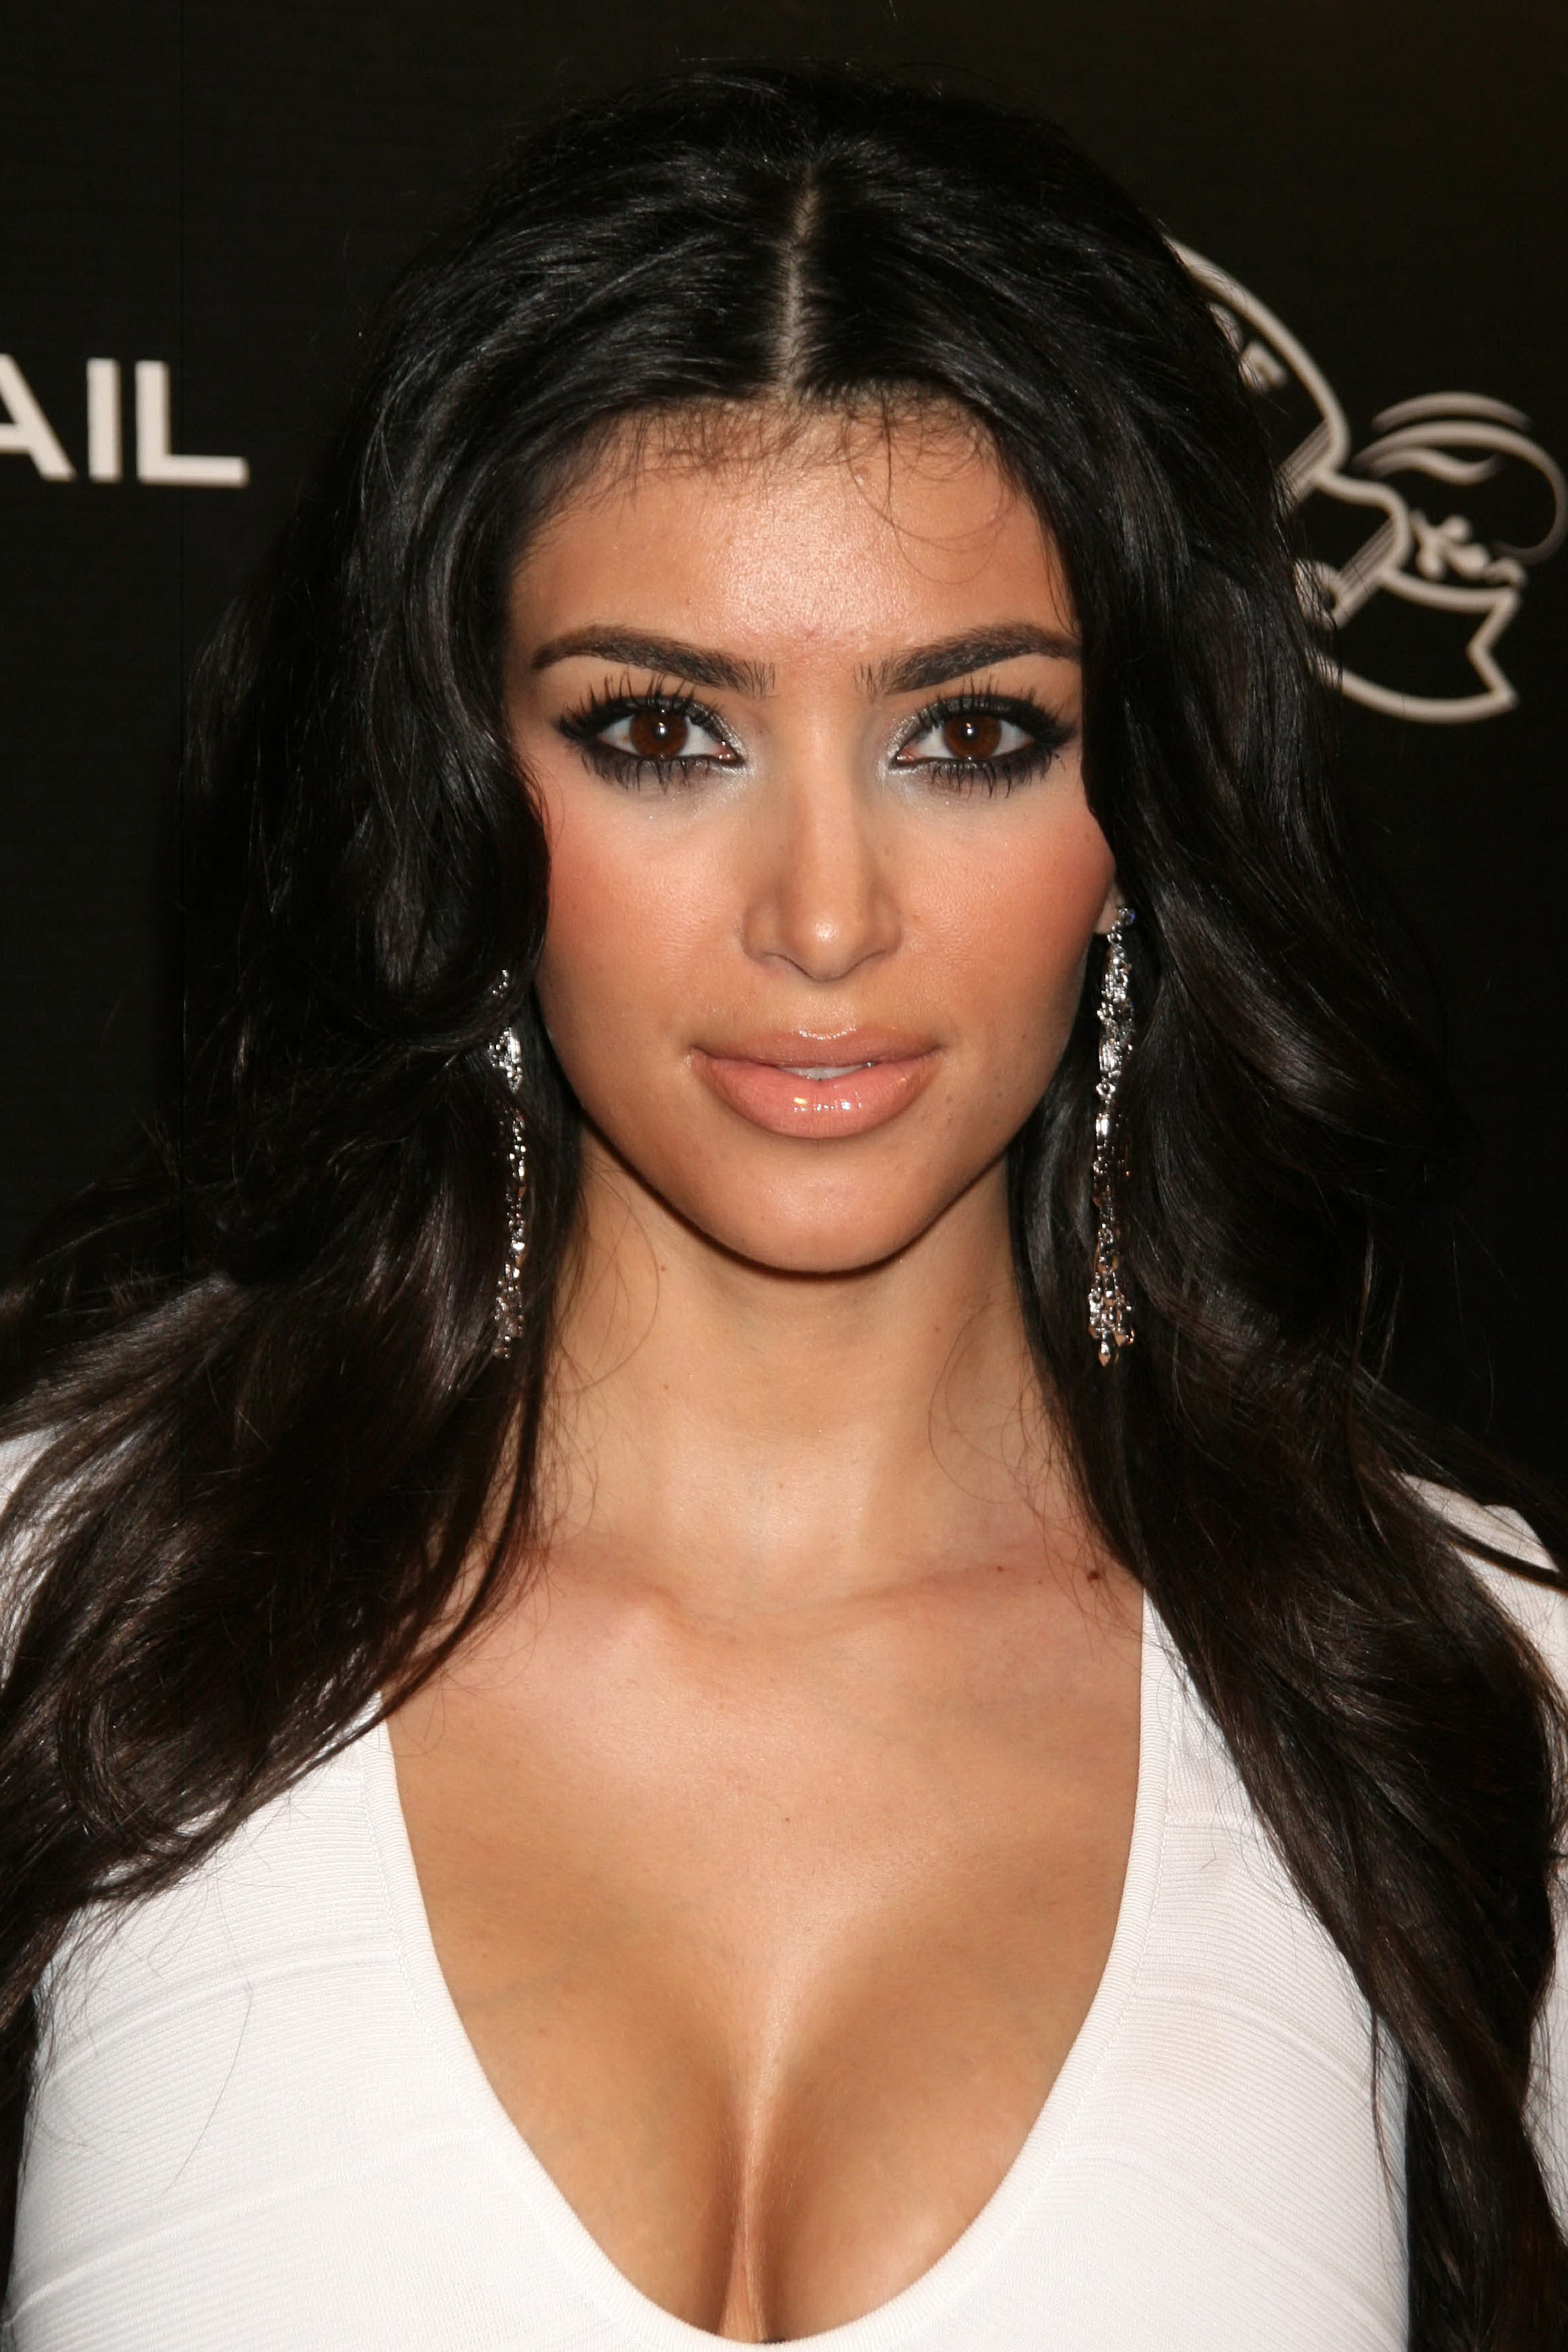 Kim Kardashian Hot 2013 Background Hd Wallpaper Kim Kardashian Hot 2336x3504